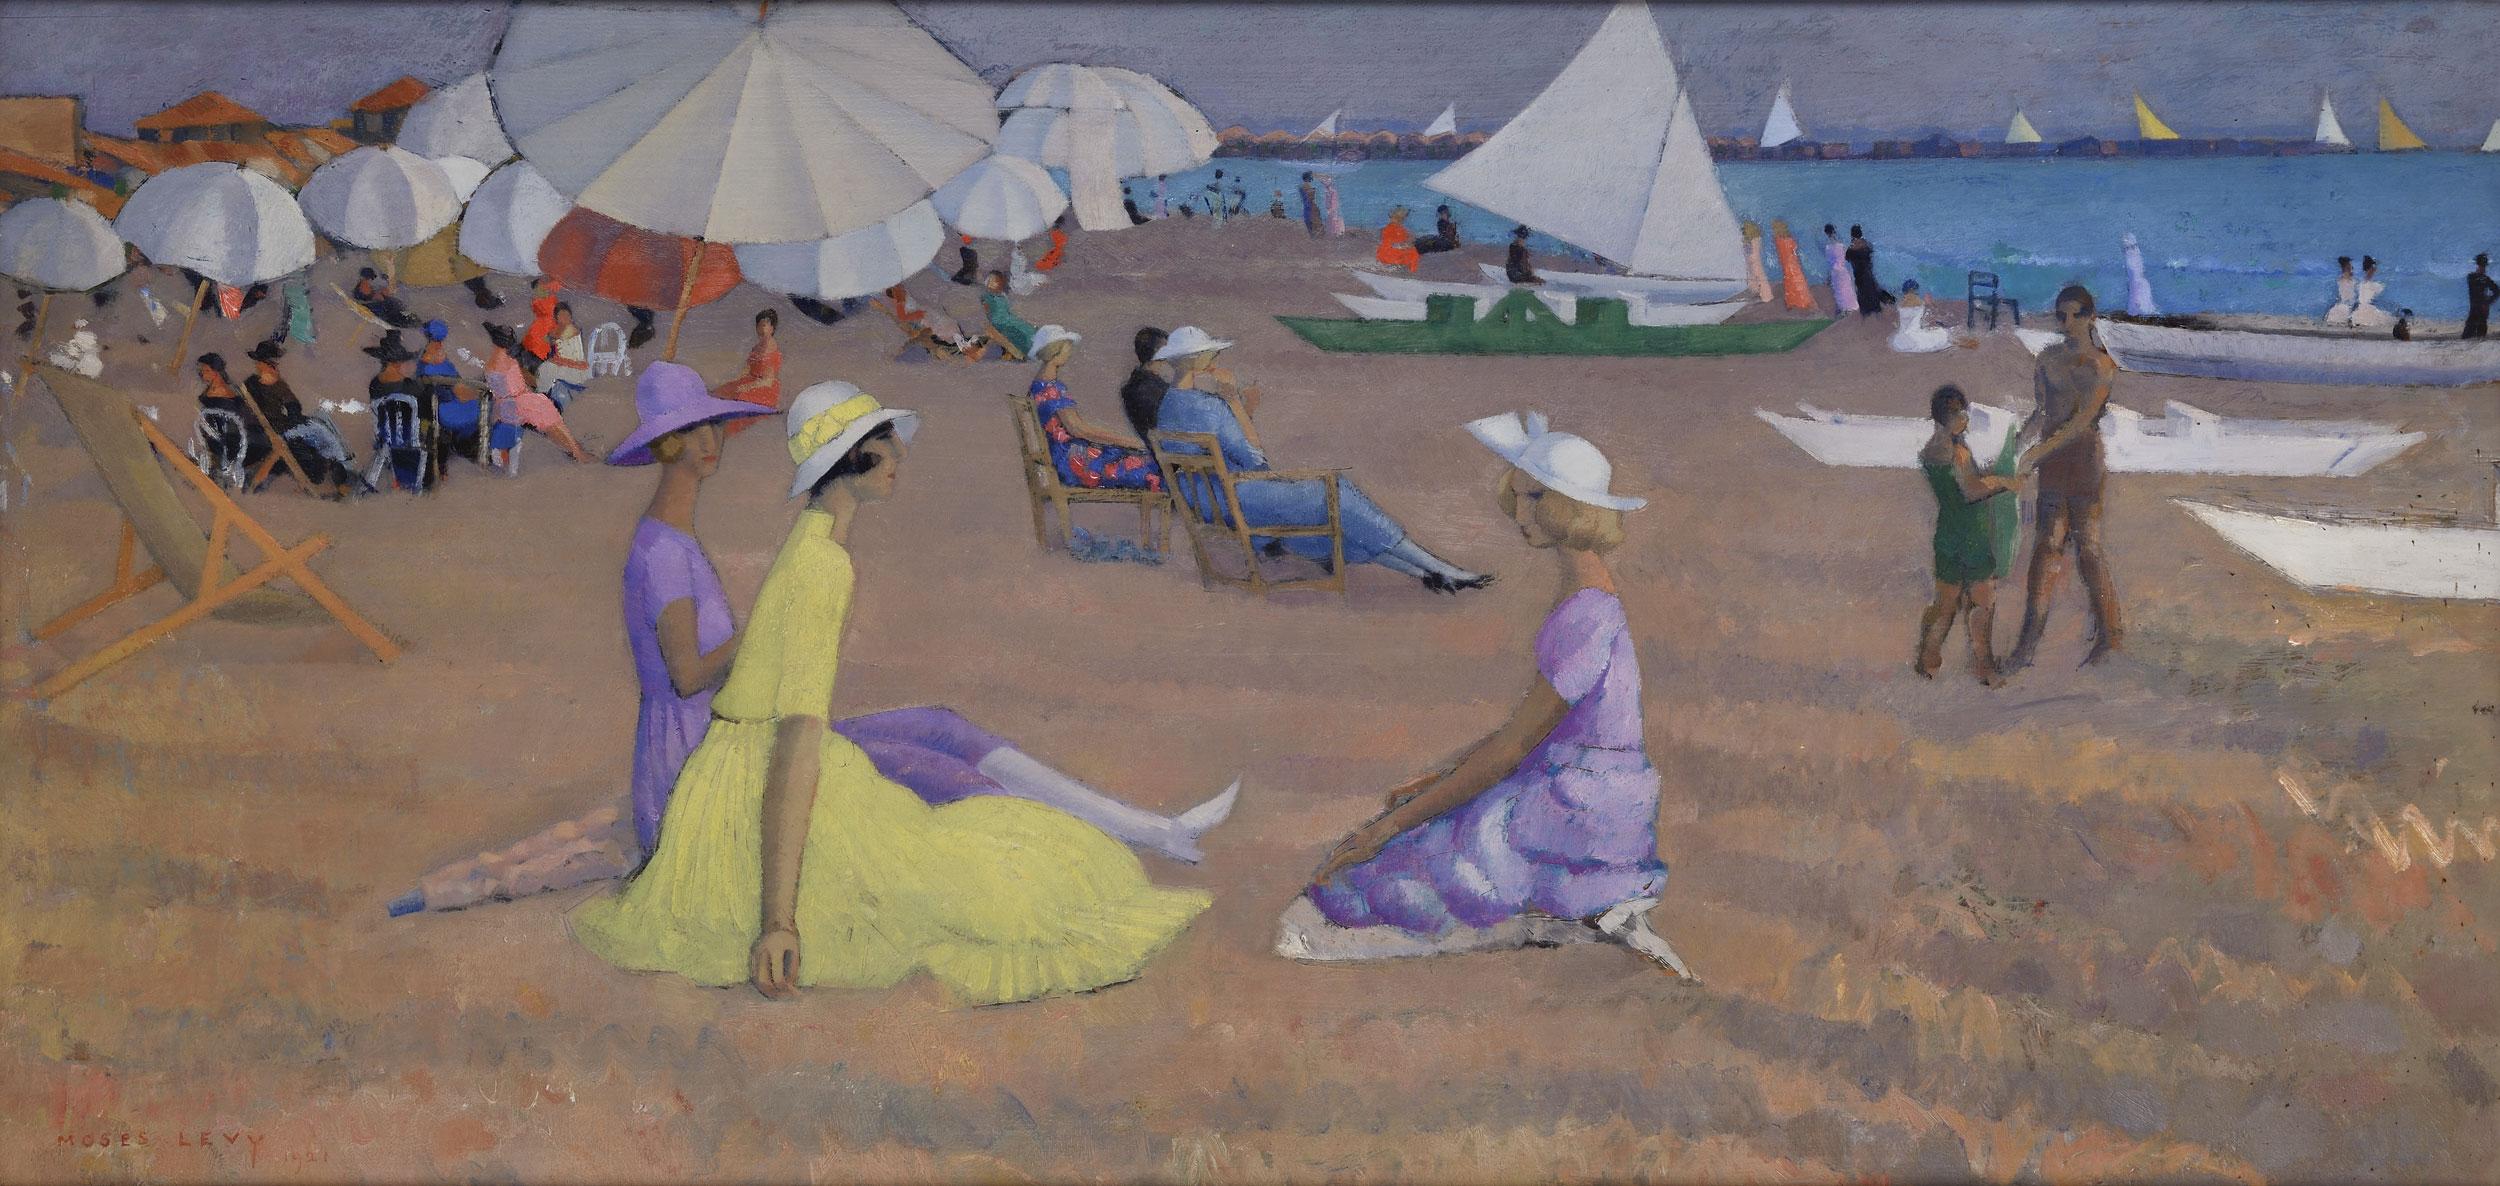 Moses Levy dipinti in vendita online